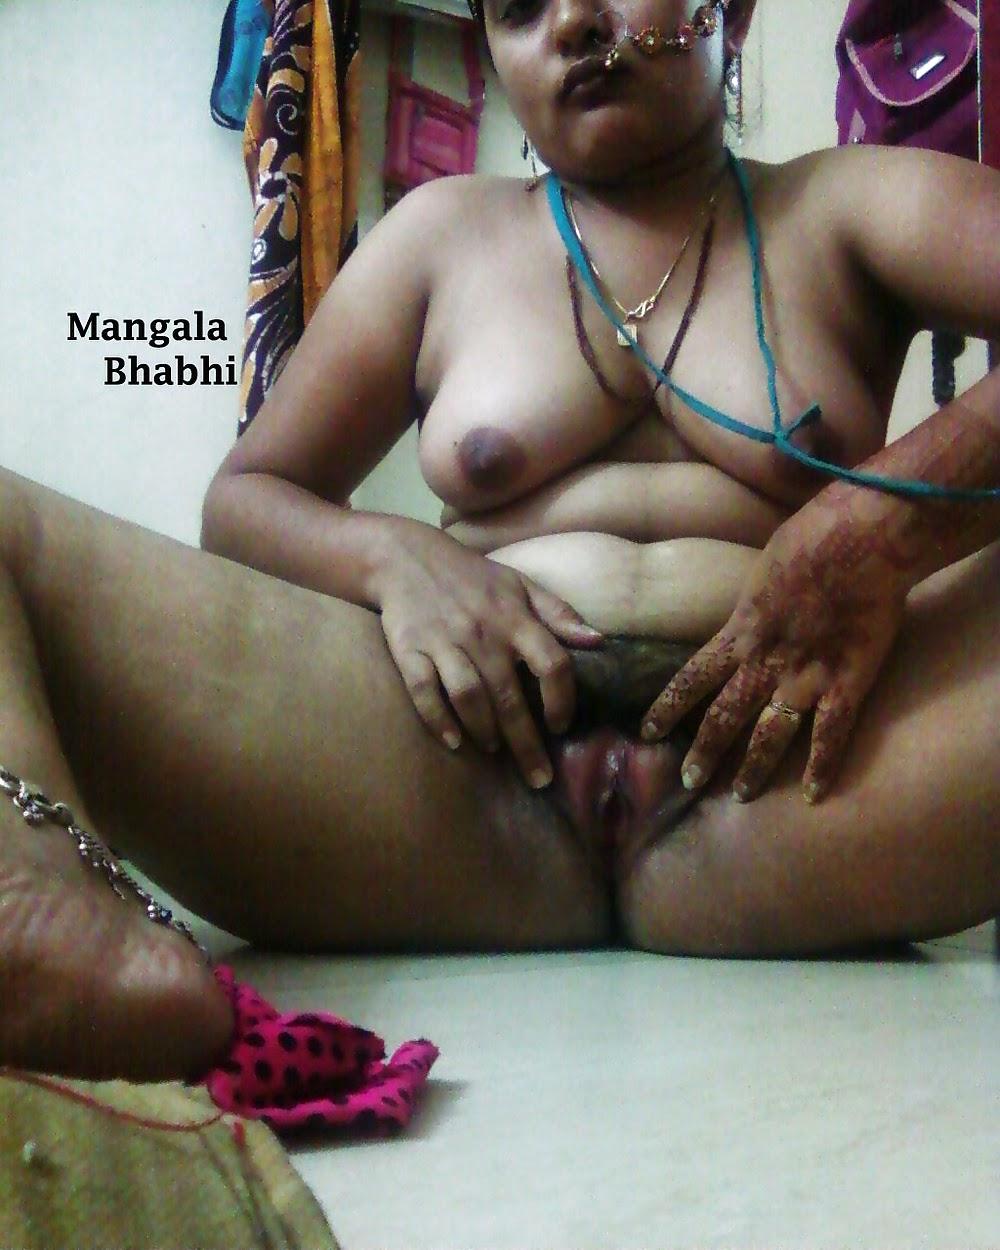 Posnetek Indijskega Seksi Bhabhija